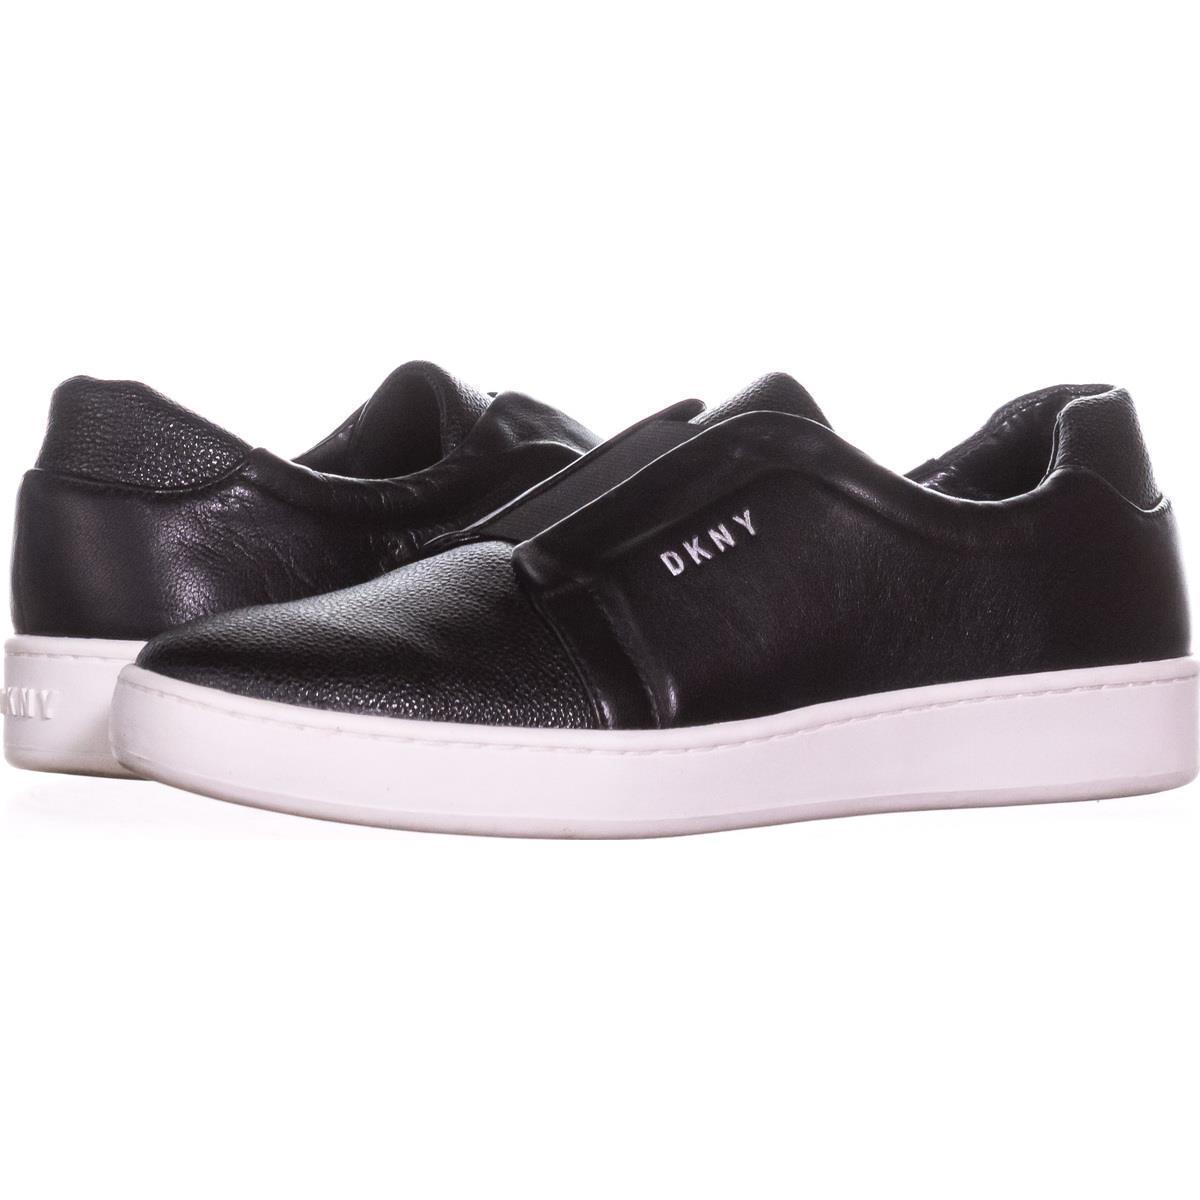 5 8 Leather R2jb Womens Details Fashion About SneakersBlackSize Top Low Slip Dkny Bobbi On 5jScRL34Aq